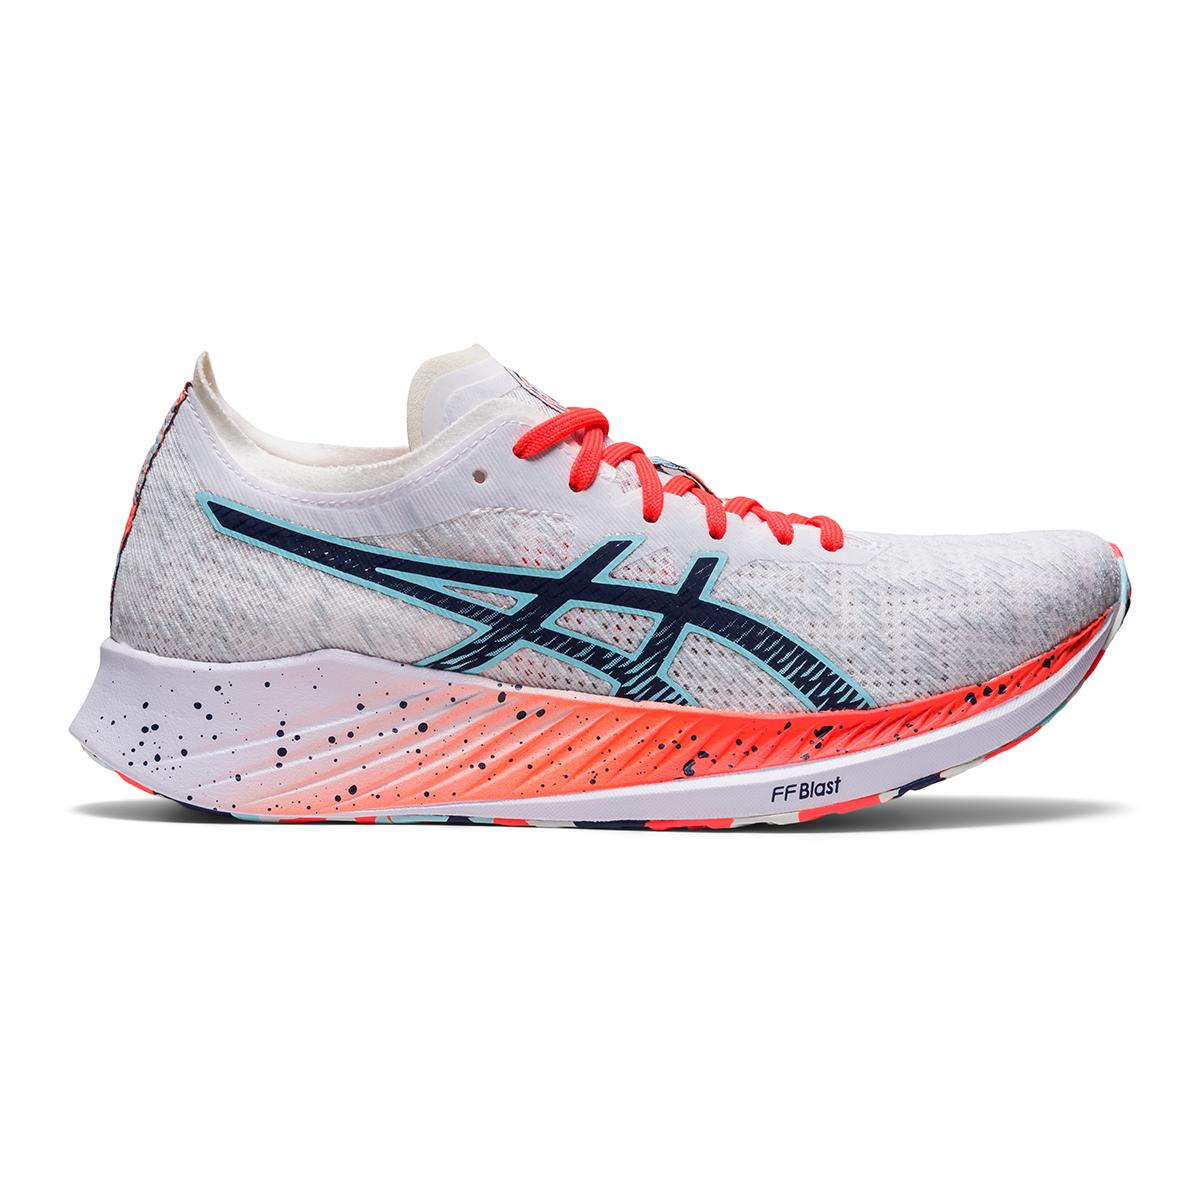 Women's Asics Magic Speed Running Shoe - Color: White/Thunder Blue - Size: 5 - Width: Regular, White/Thunder Blue, large, image 1